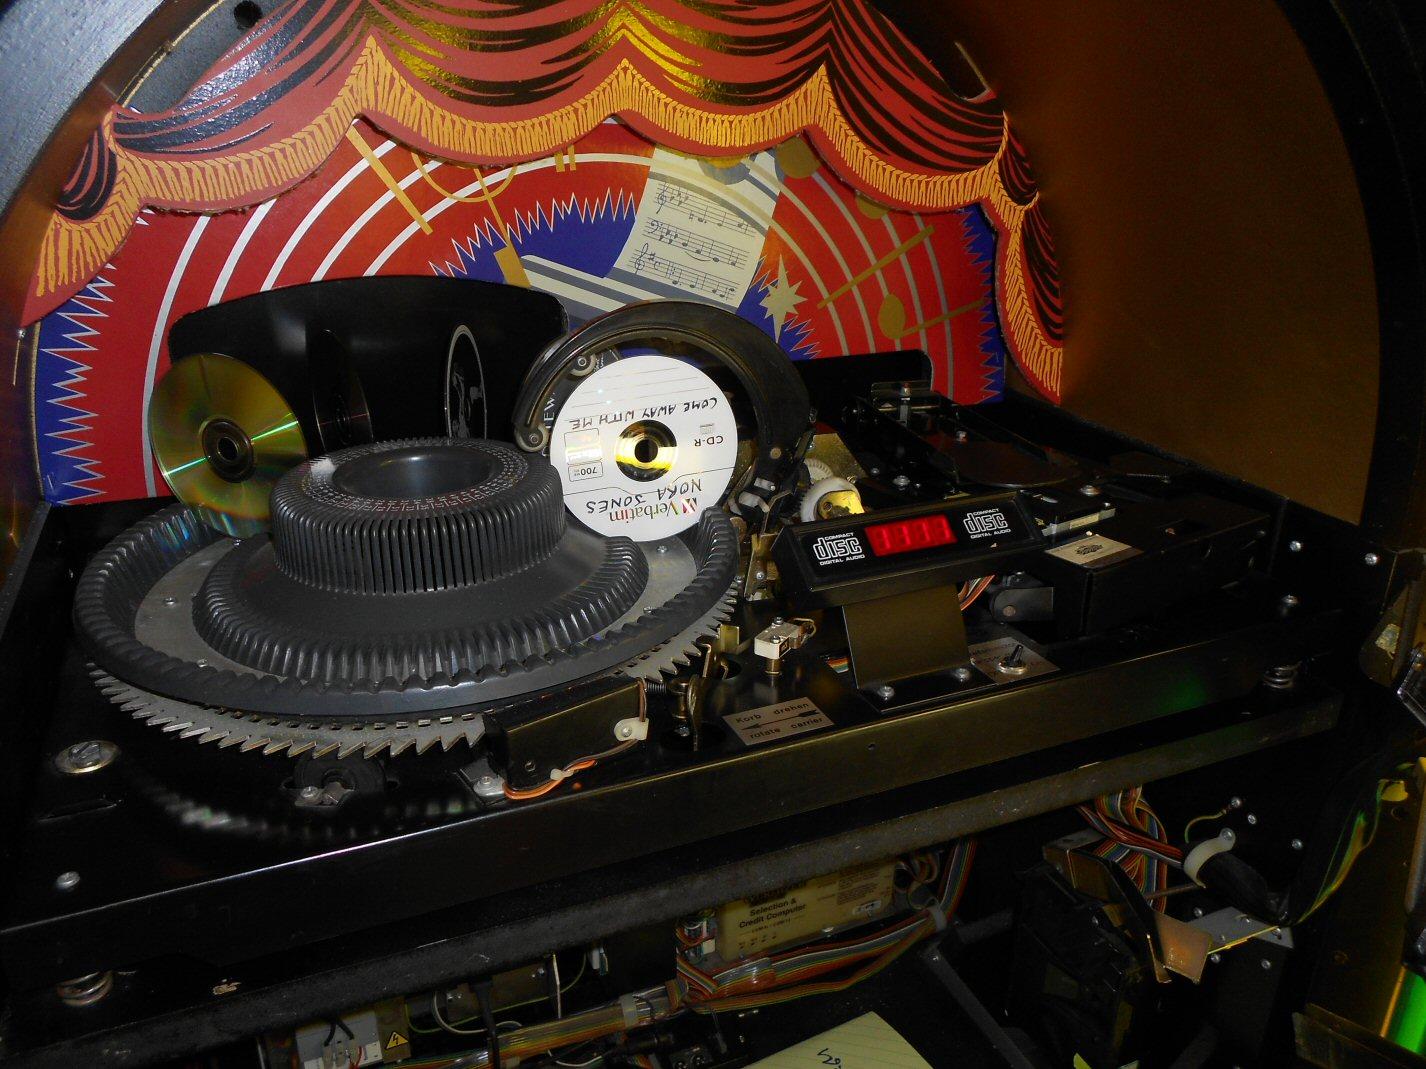 Wurlitzer One More Time CD jukebox